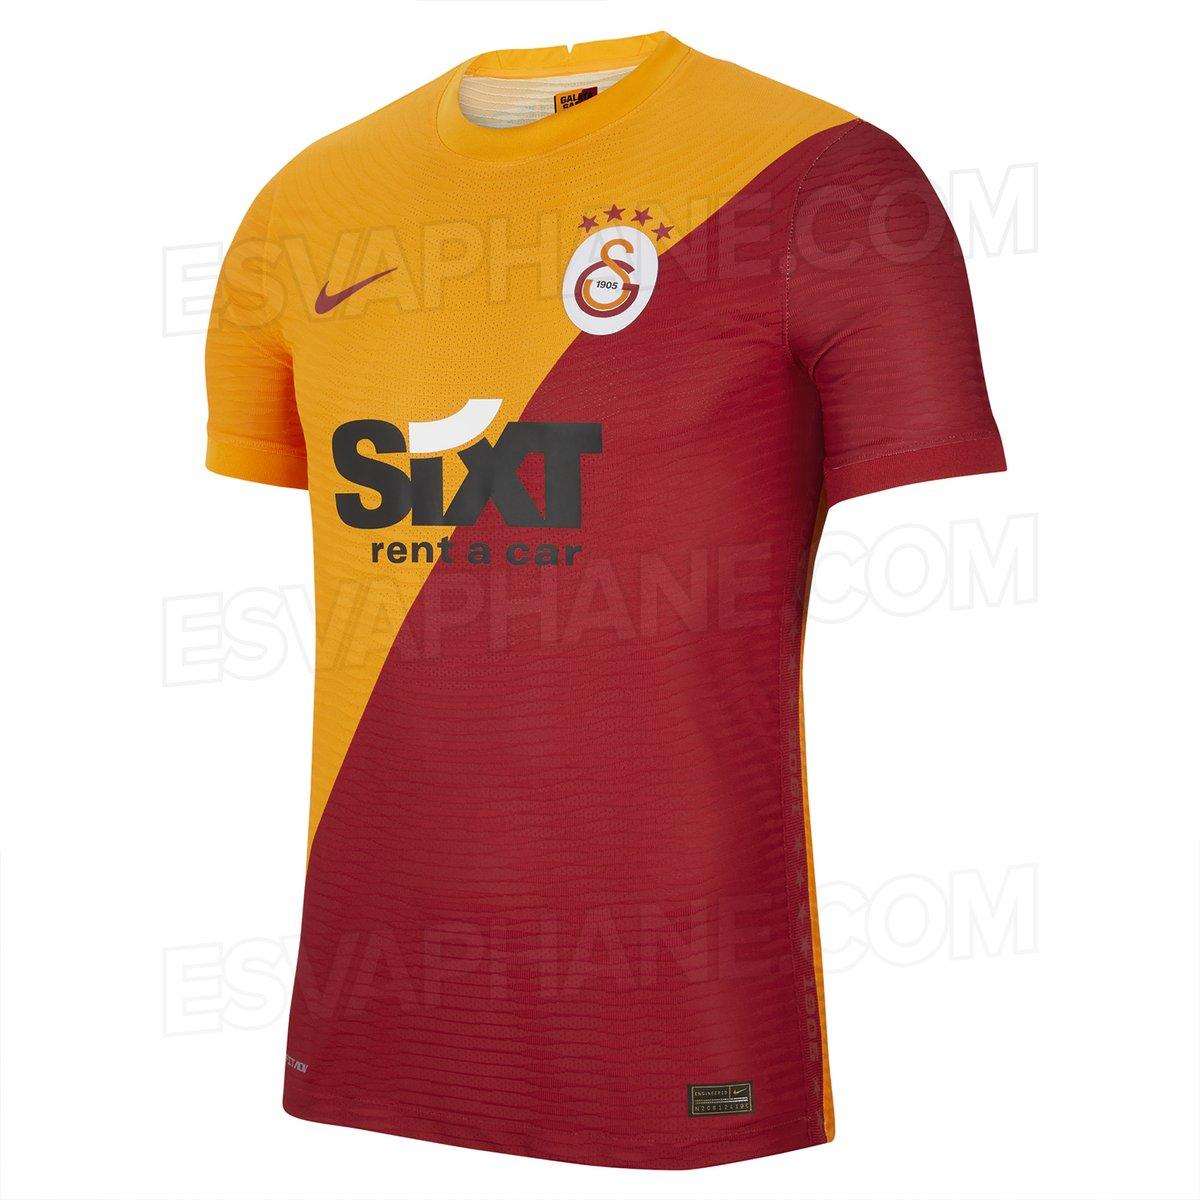 Filtraciones clubes Nike 2021-22 - Galatasaray